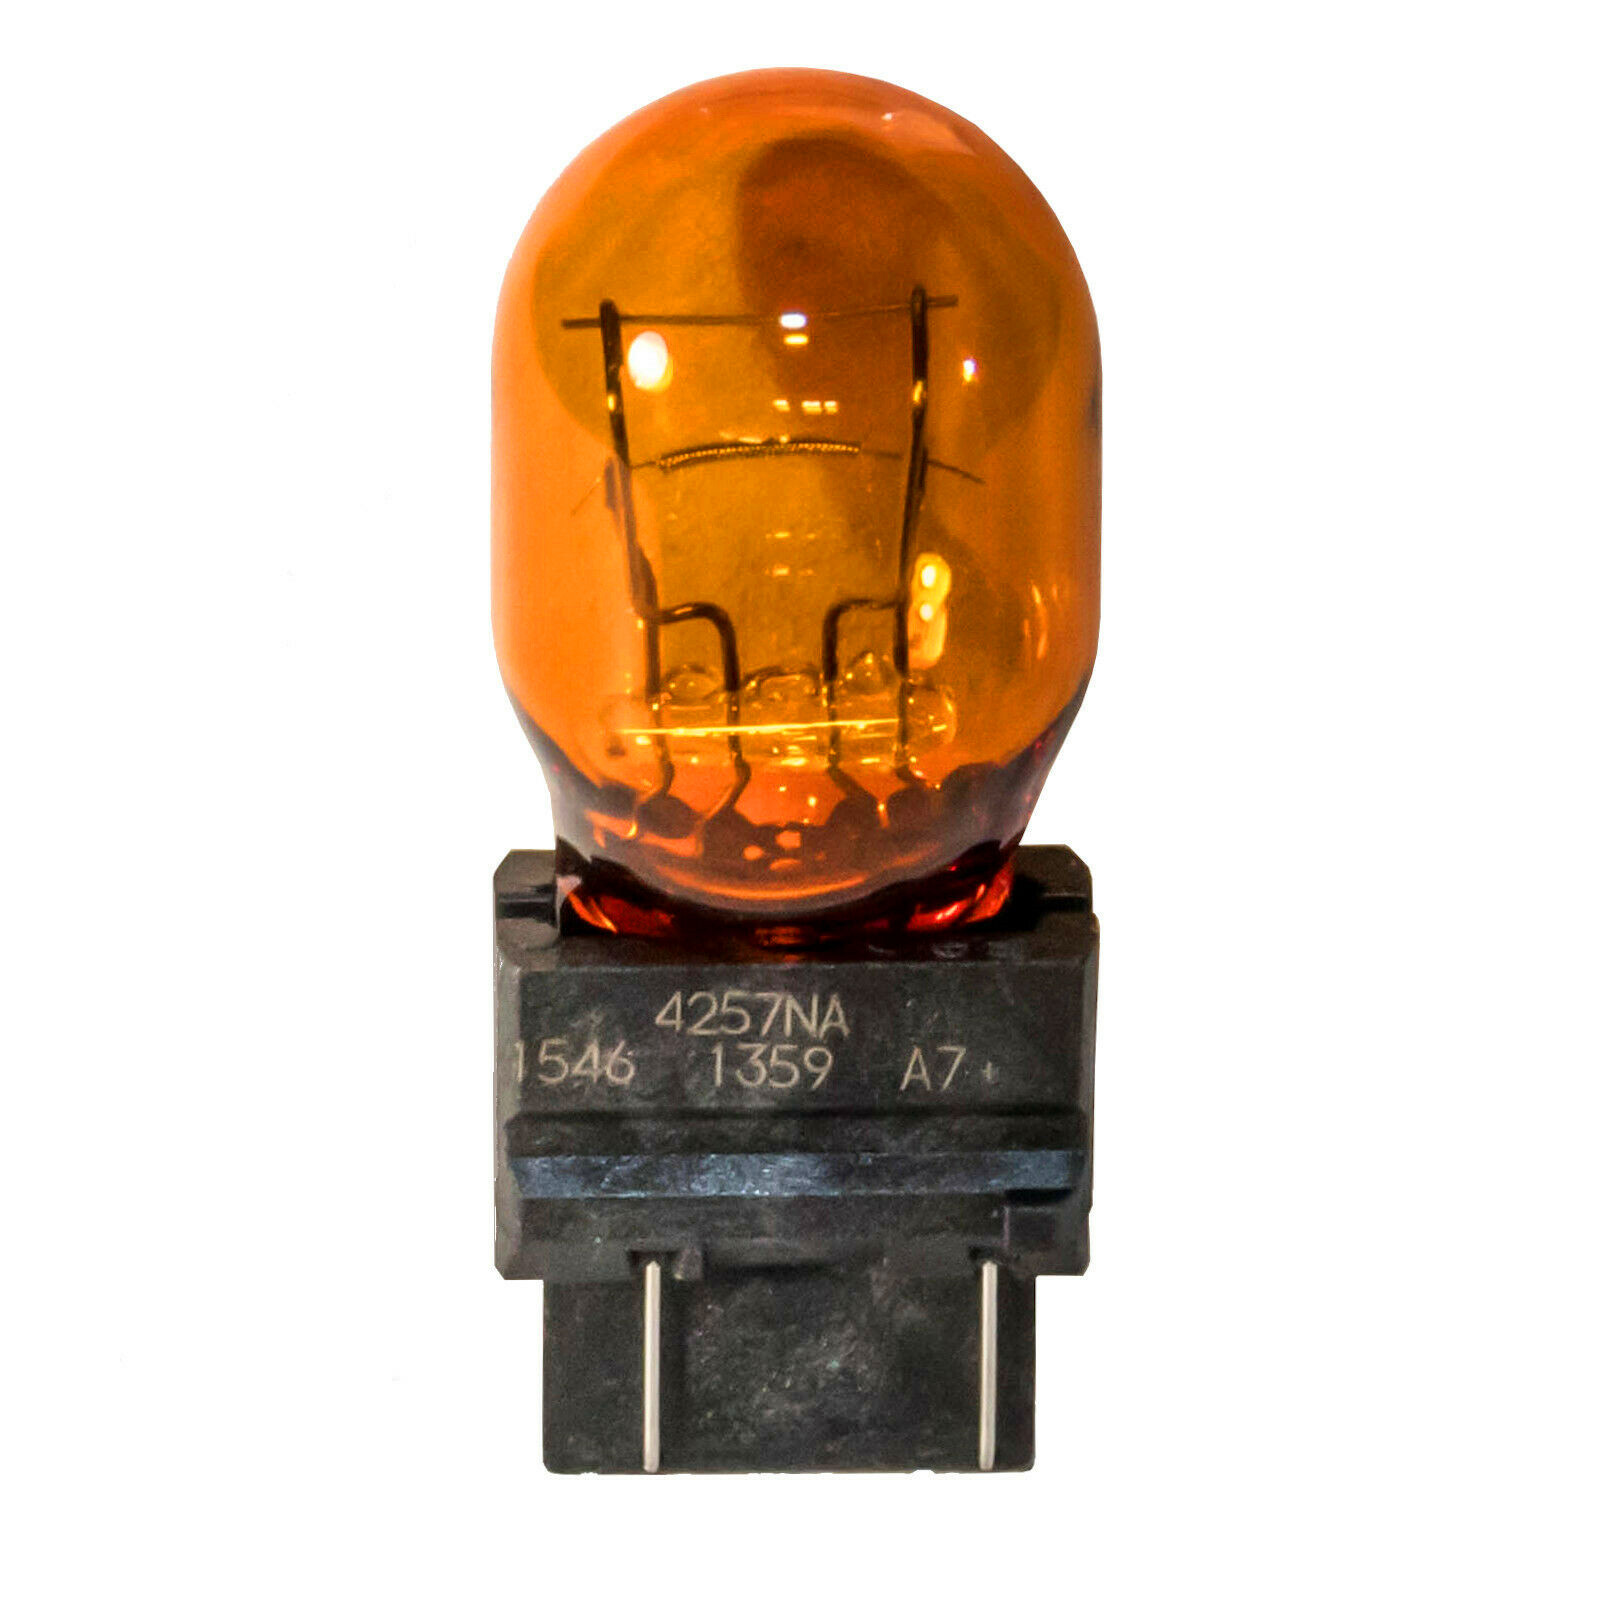 2019 Ford F150 Turn Signal Lights Bulb Size 4257NA LED Blinker lamps